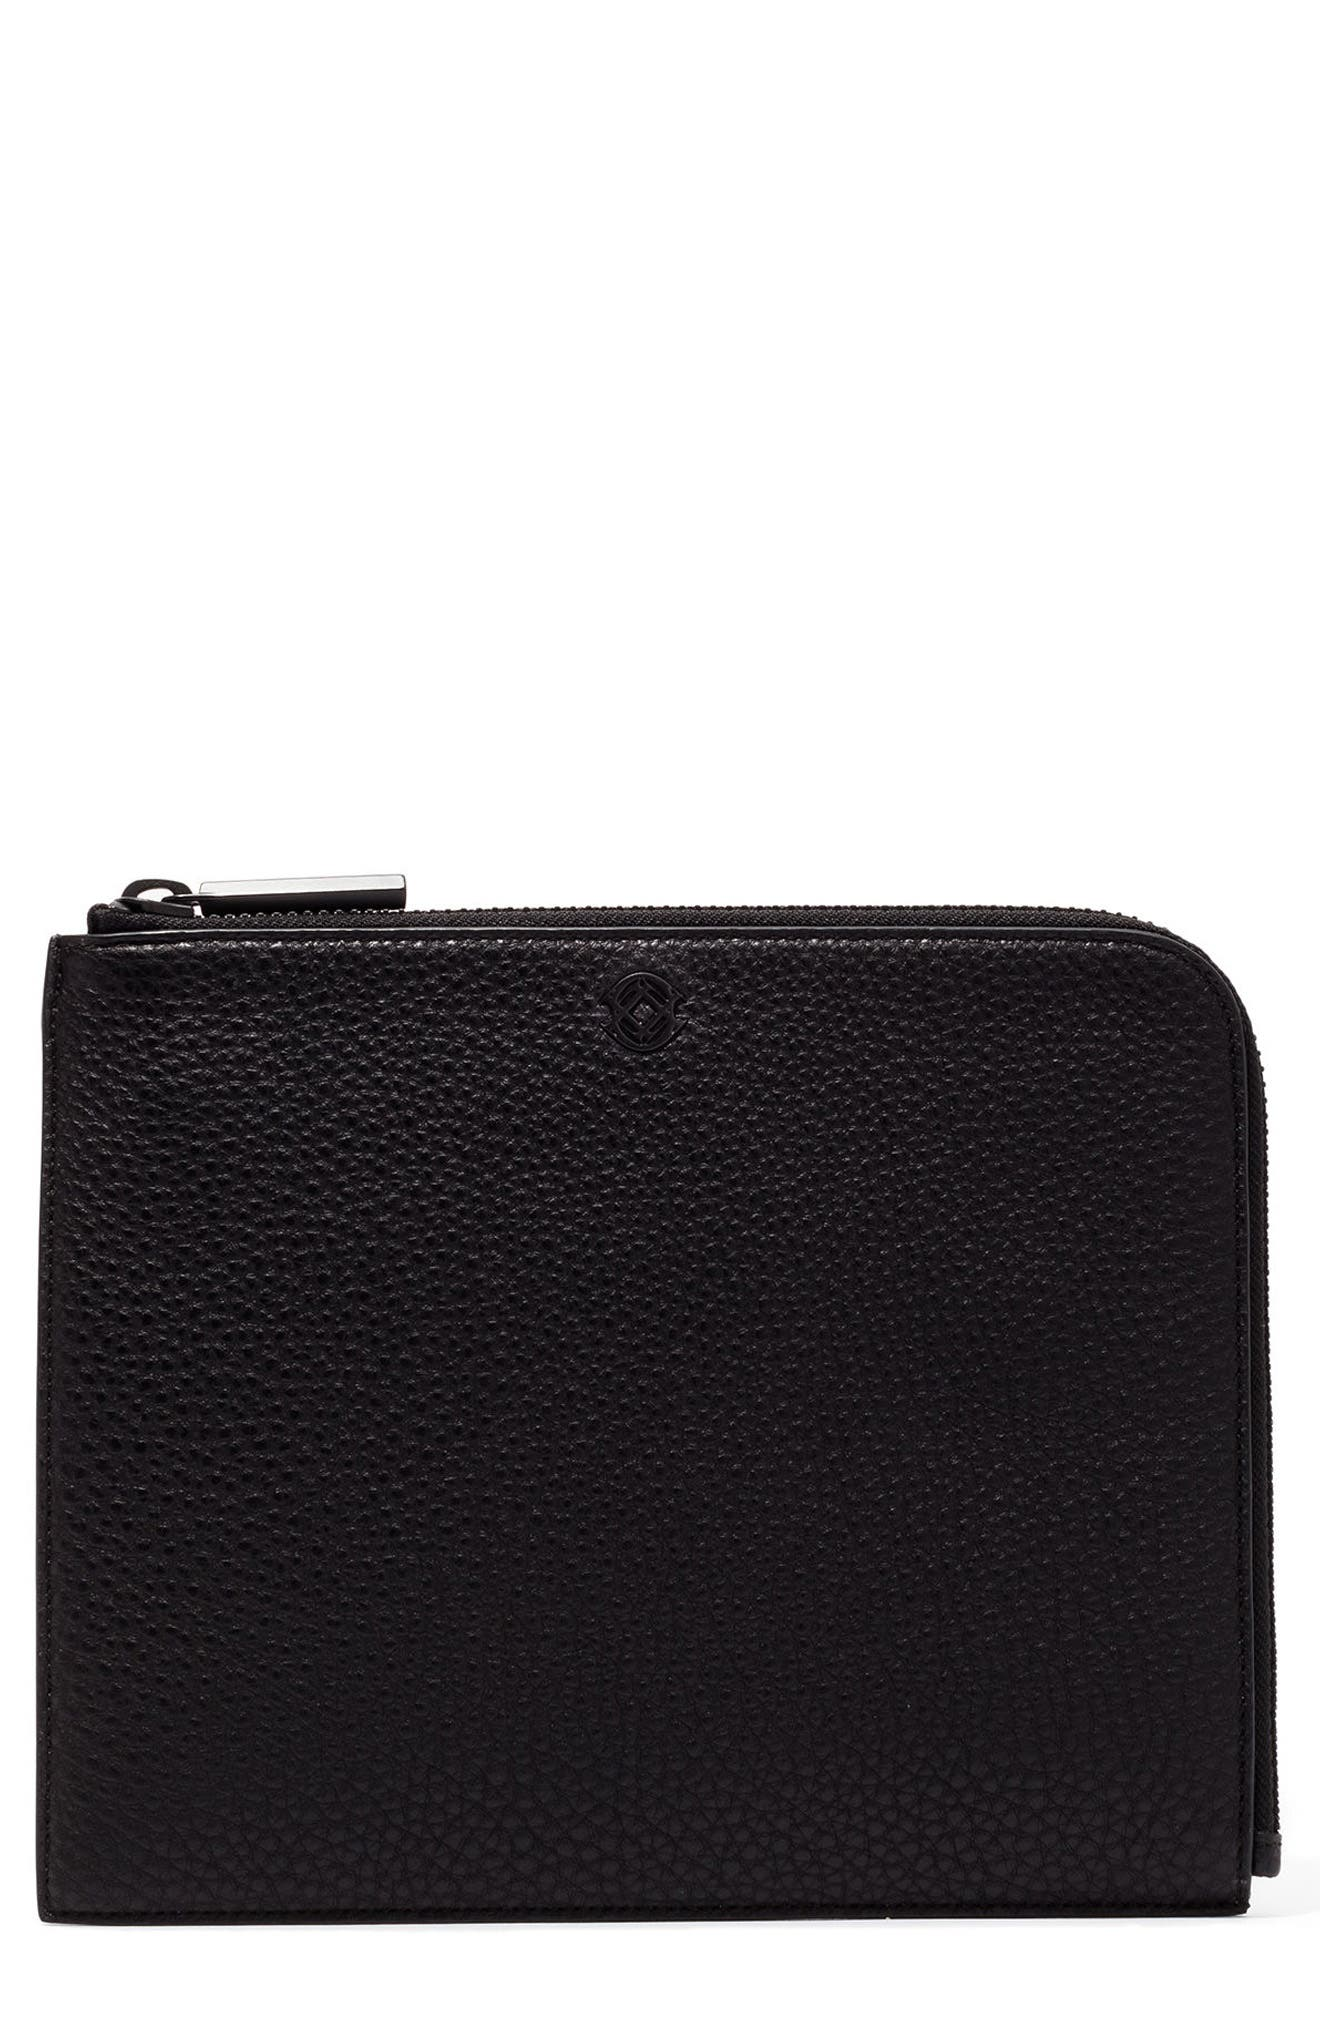 Large Elle Leather Clutch,                         Main,                         color, BONE/ ONYX